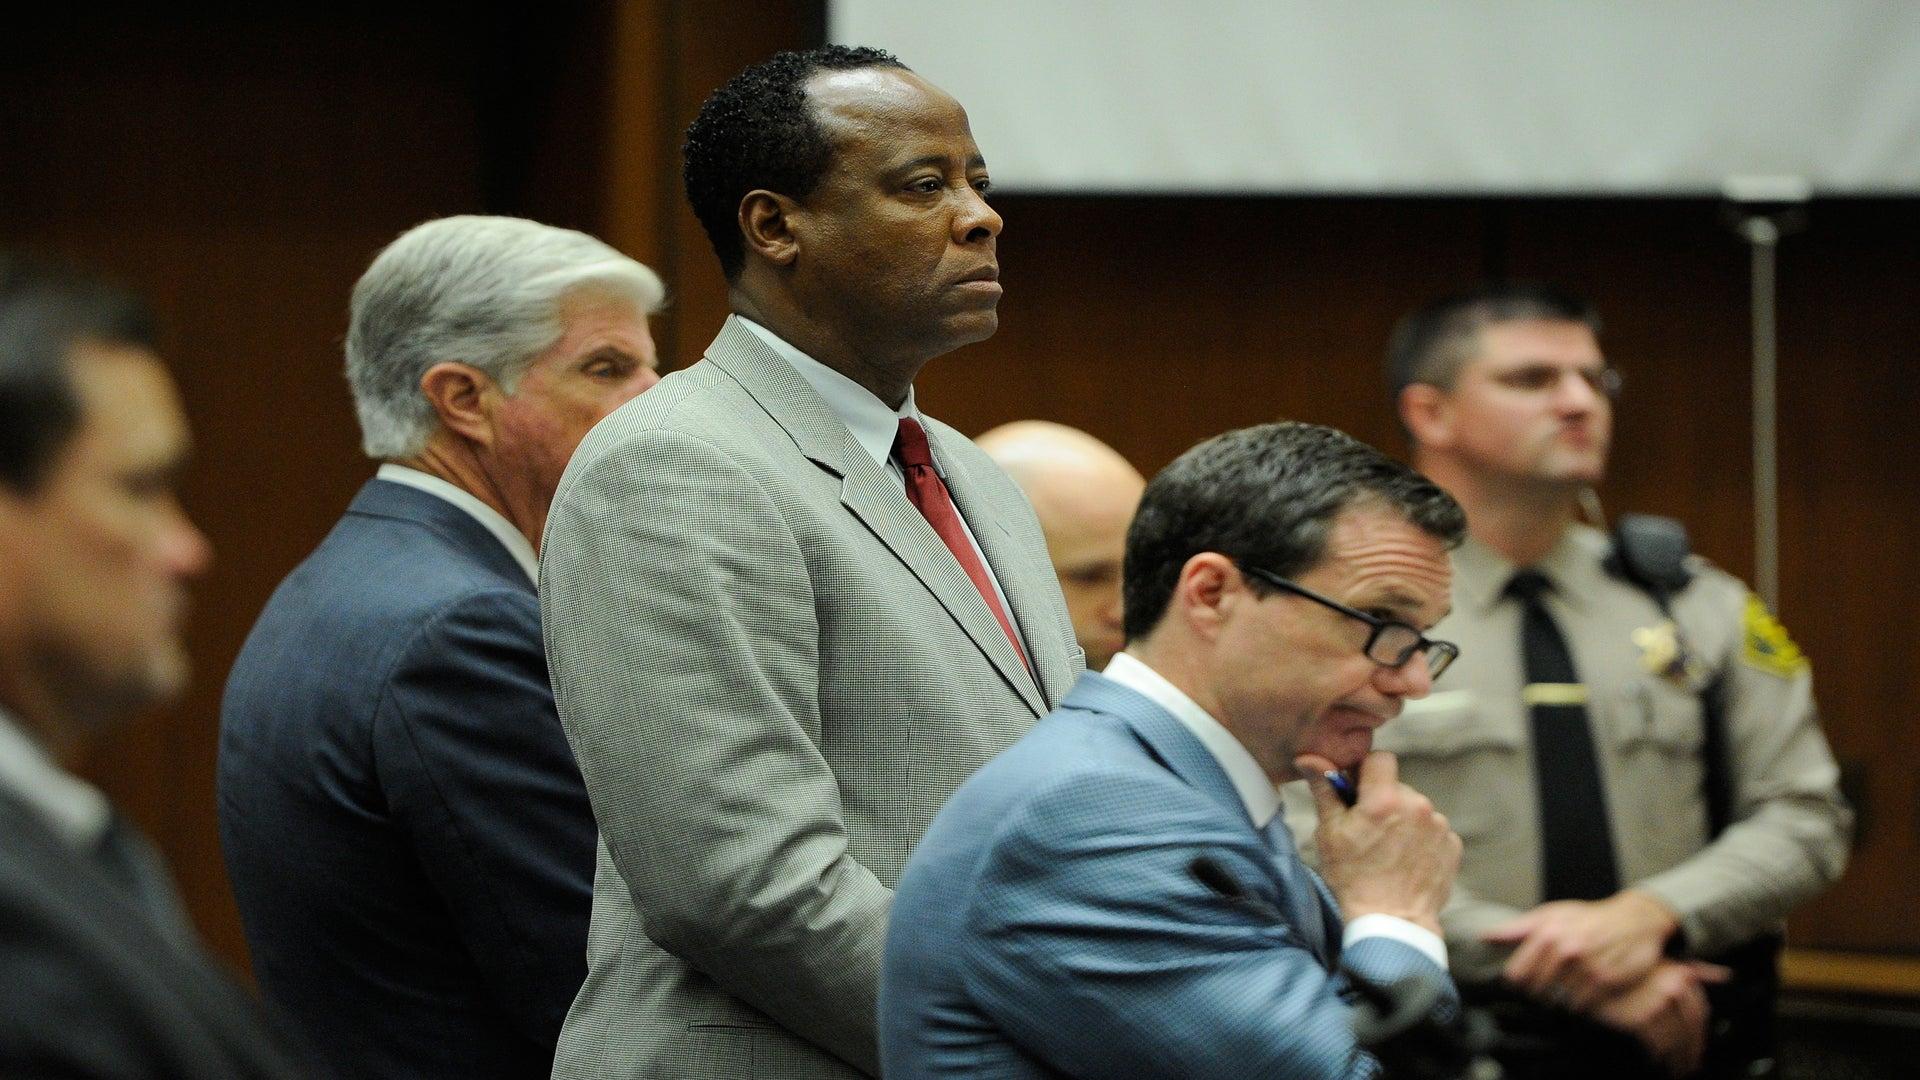 Dr. Conrad Murray Receives Maximum Sentence